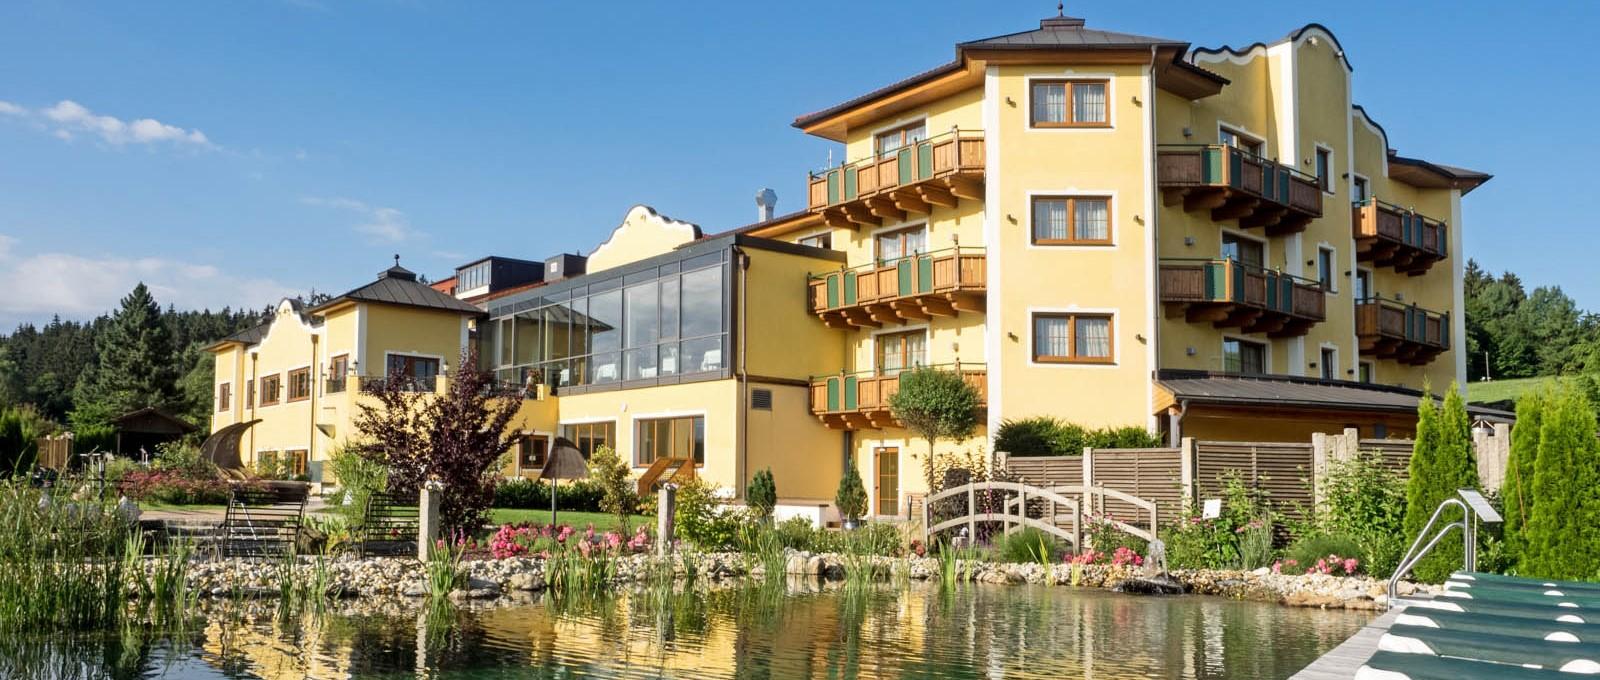 Wellnesshotel reischlhof in sperlbrunn landkarte wegscheid for 4 sterne hotel dortmund